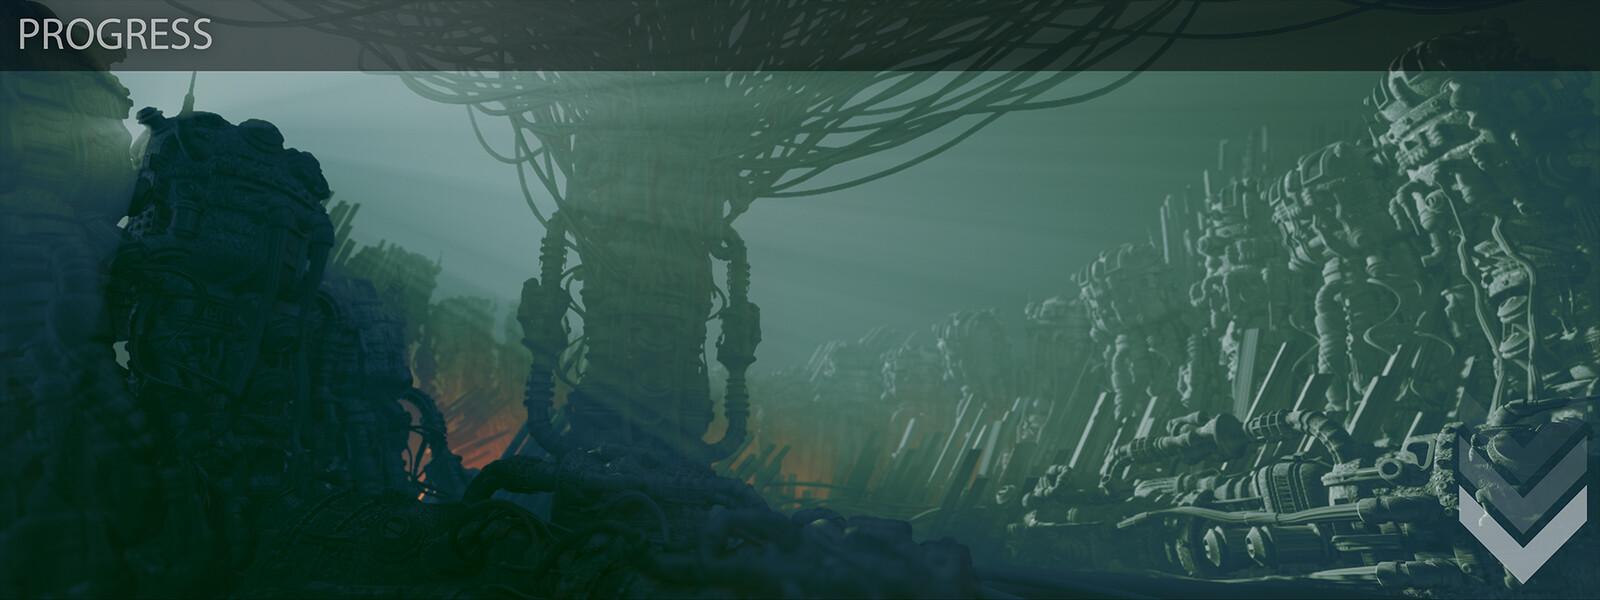 Amaru - Progression shots from original exploration to near final composition/lighting. 2 of 4